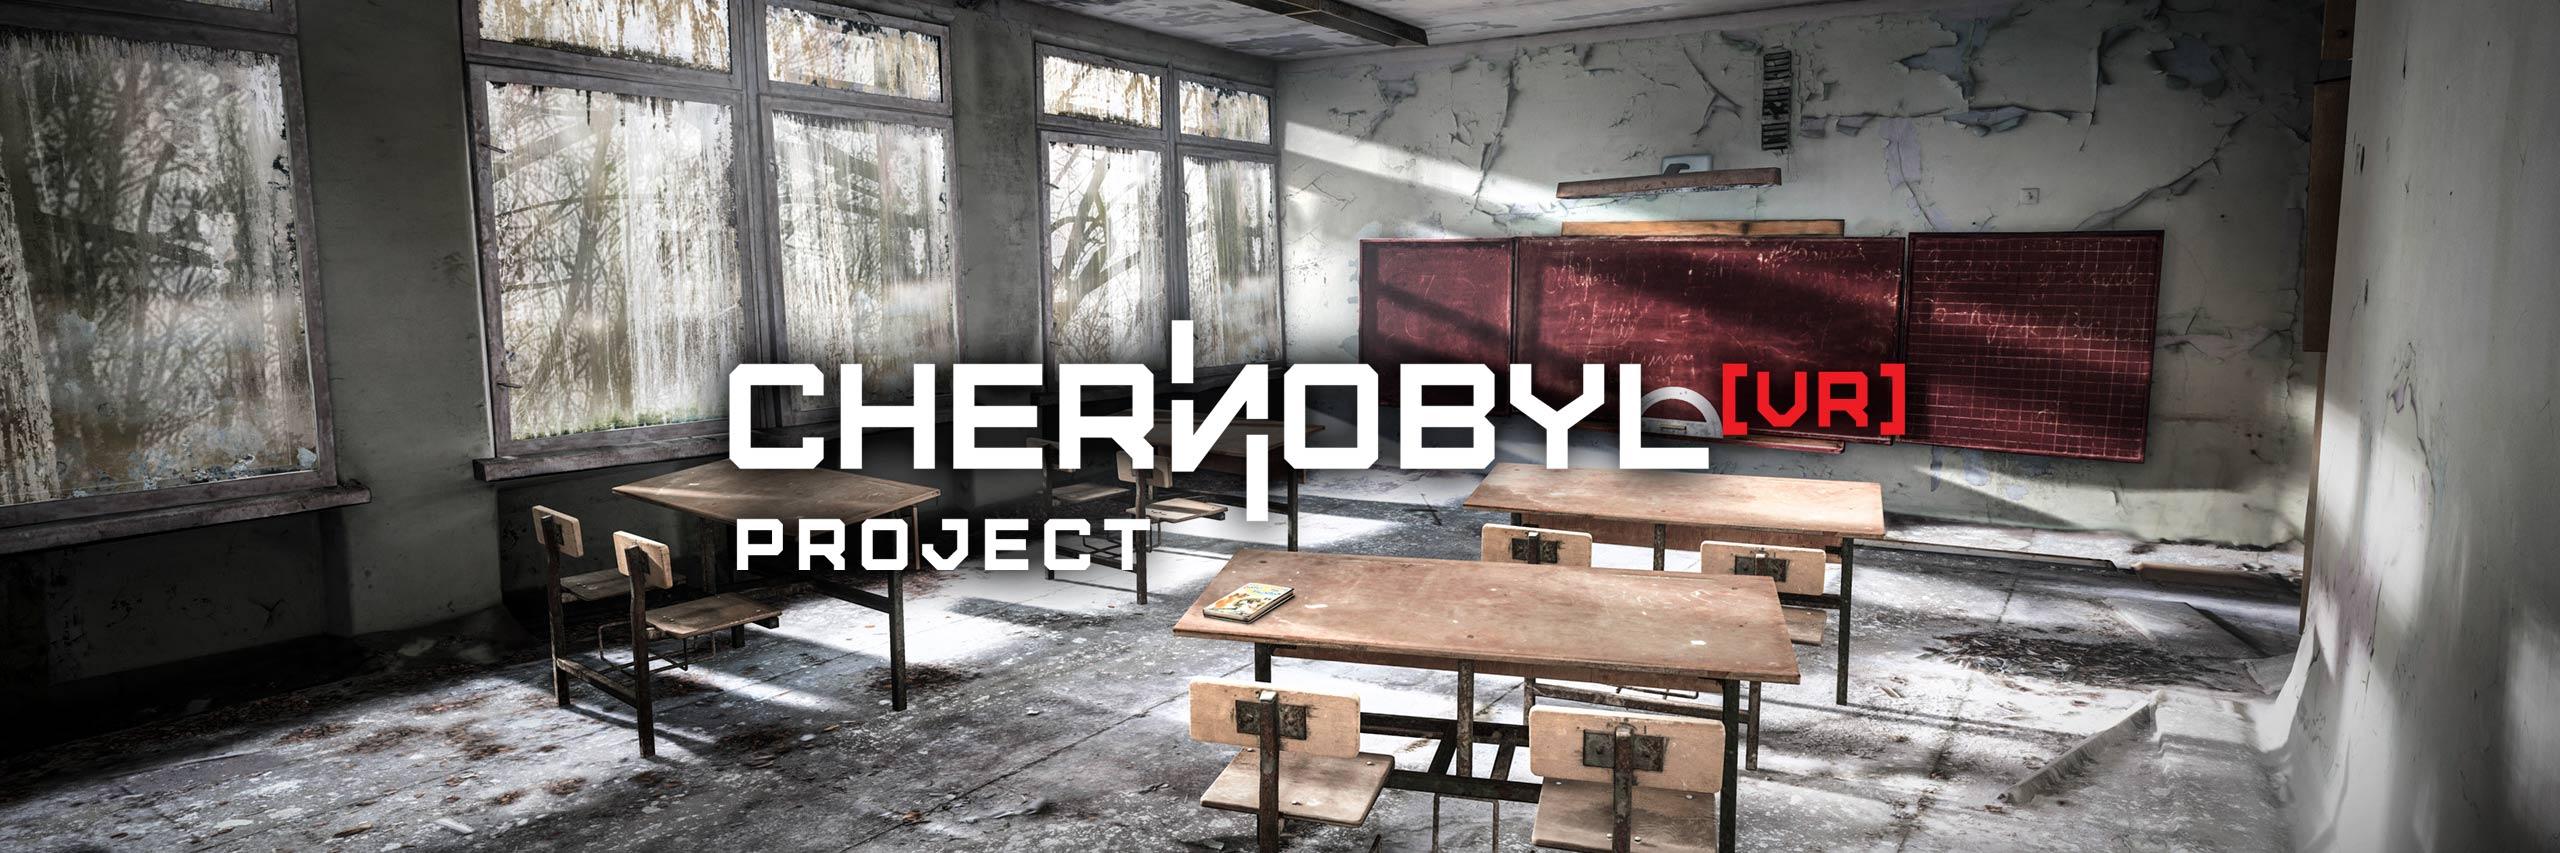 Alle Infos zu Chernobyl Project (HTCVive,OculusRift,PC,VirtualReality)